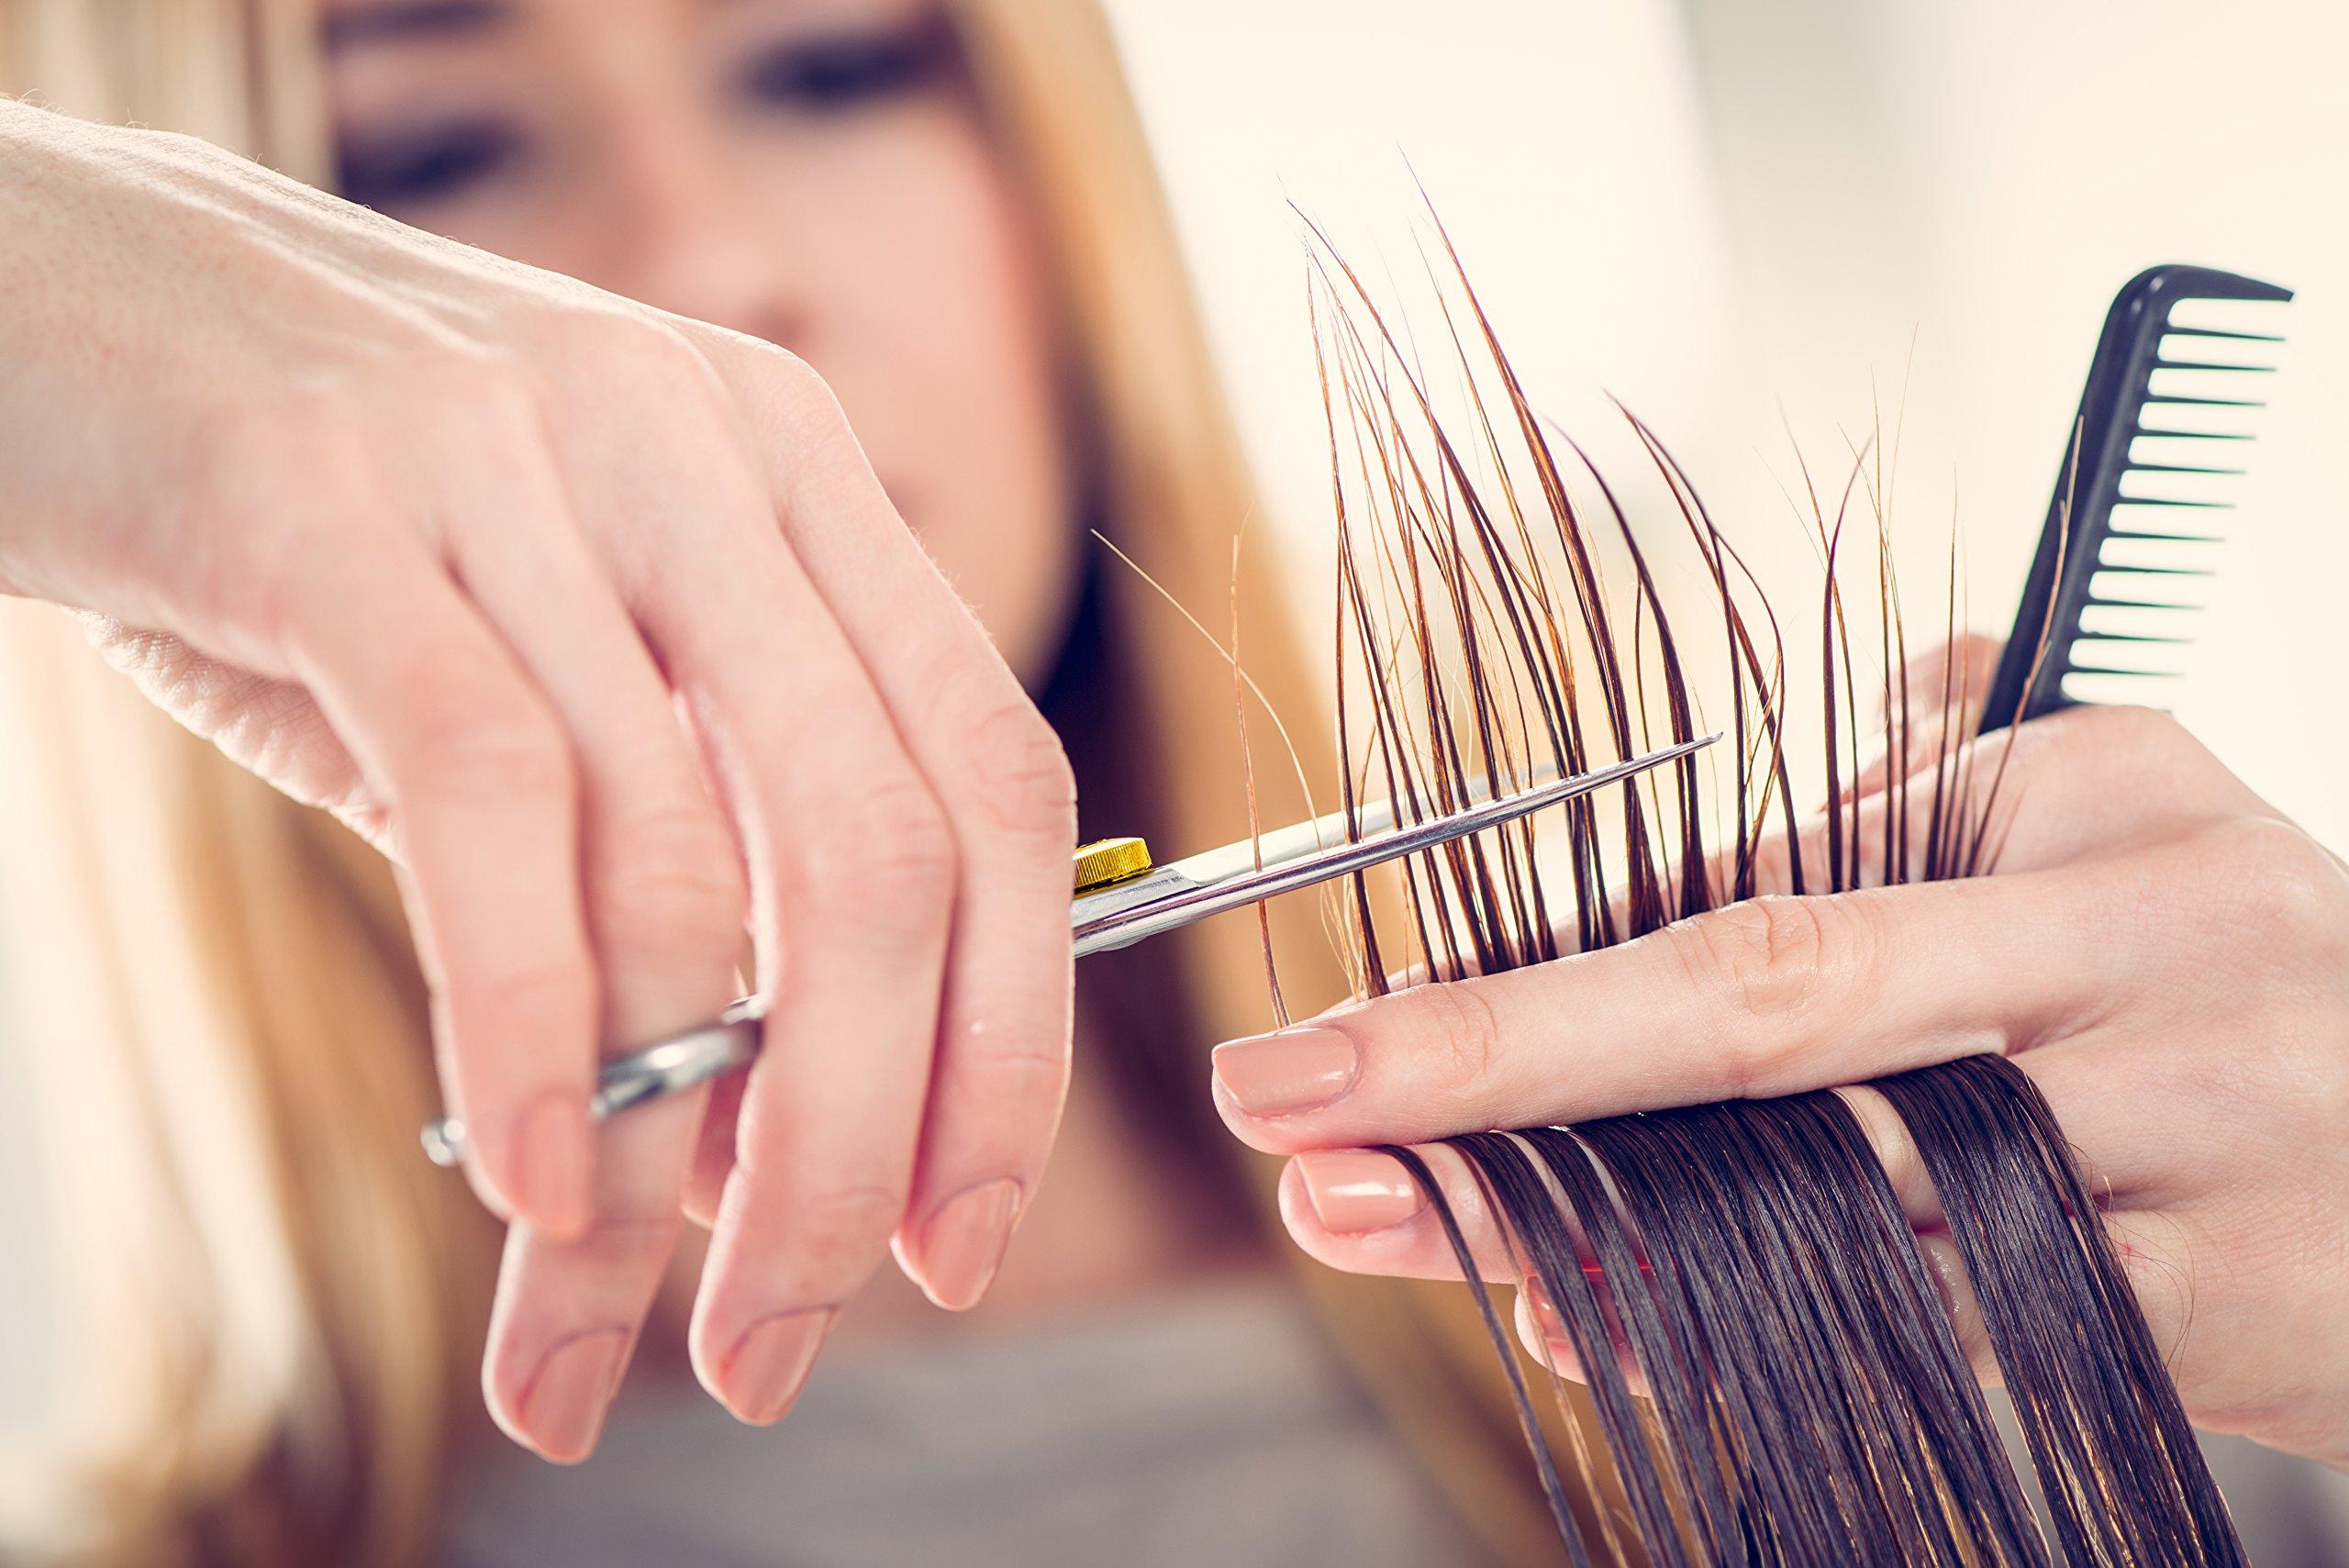 Professional Barber Scissor Hair Cutting Set - 6.5'' - 1 Straight Edge Hair Scissor, 1 Texturizing Thinning Shears, Plus Bonus Faux Leather Case - By ShearGuru … by ShearGuru (Image #5)